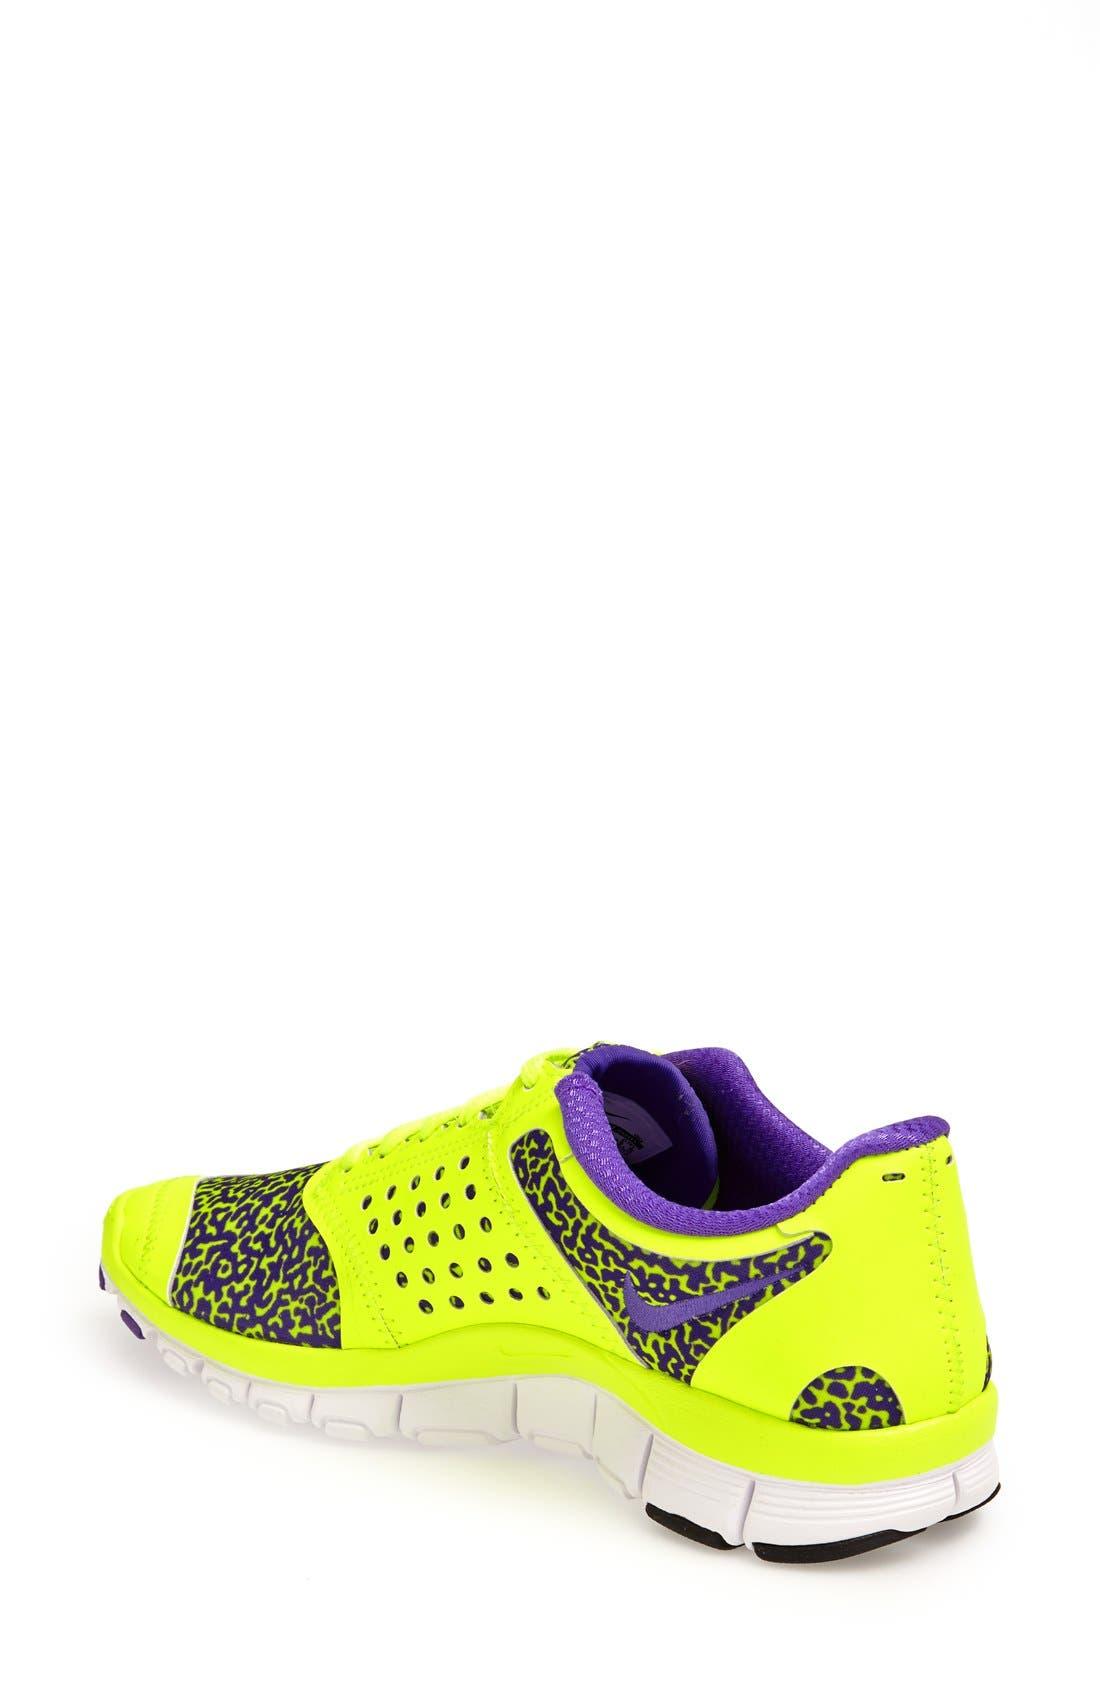 Alternate Image 2  - Nike 'Free 5.0 V4' Running Shoe (Women)